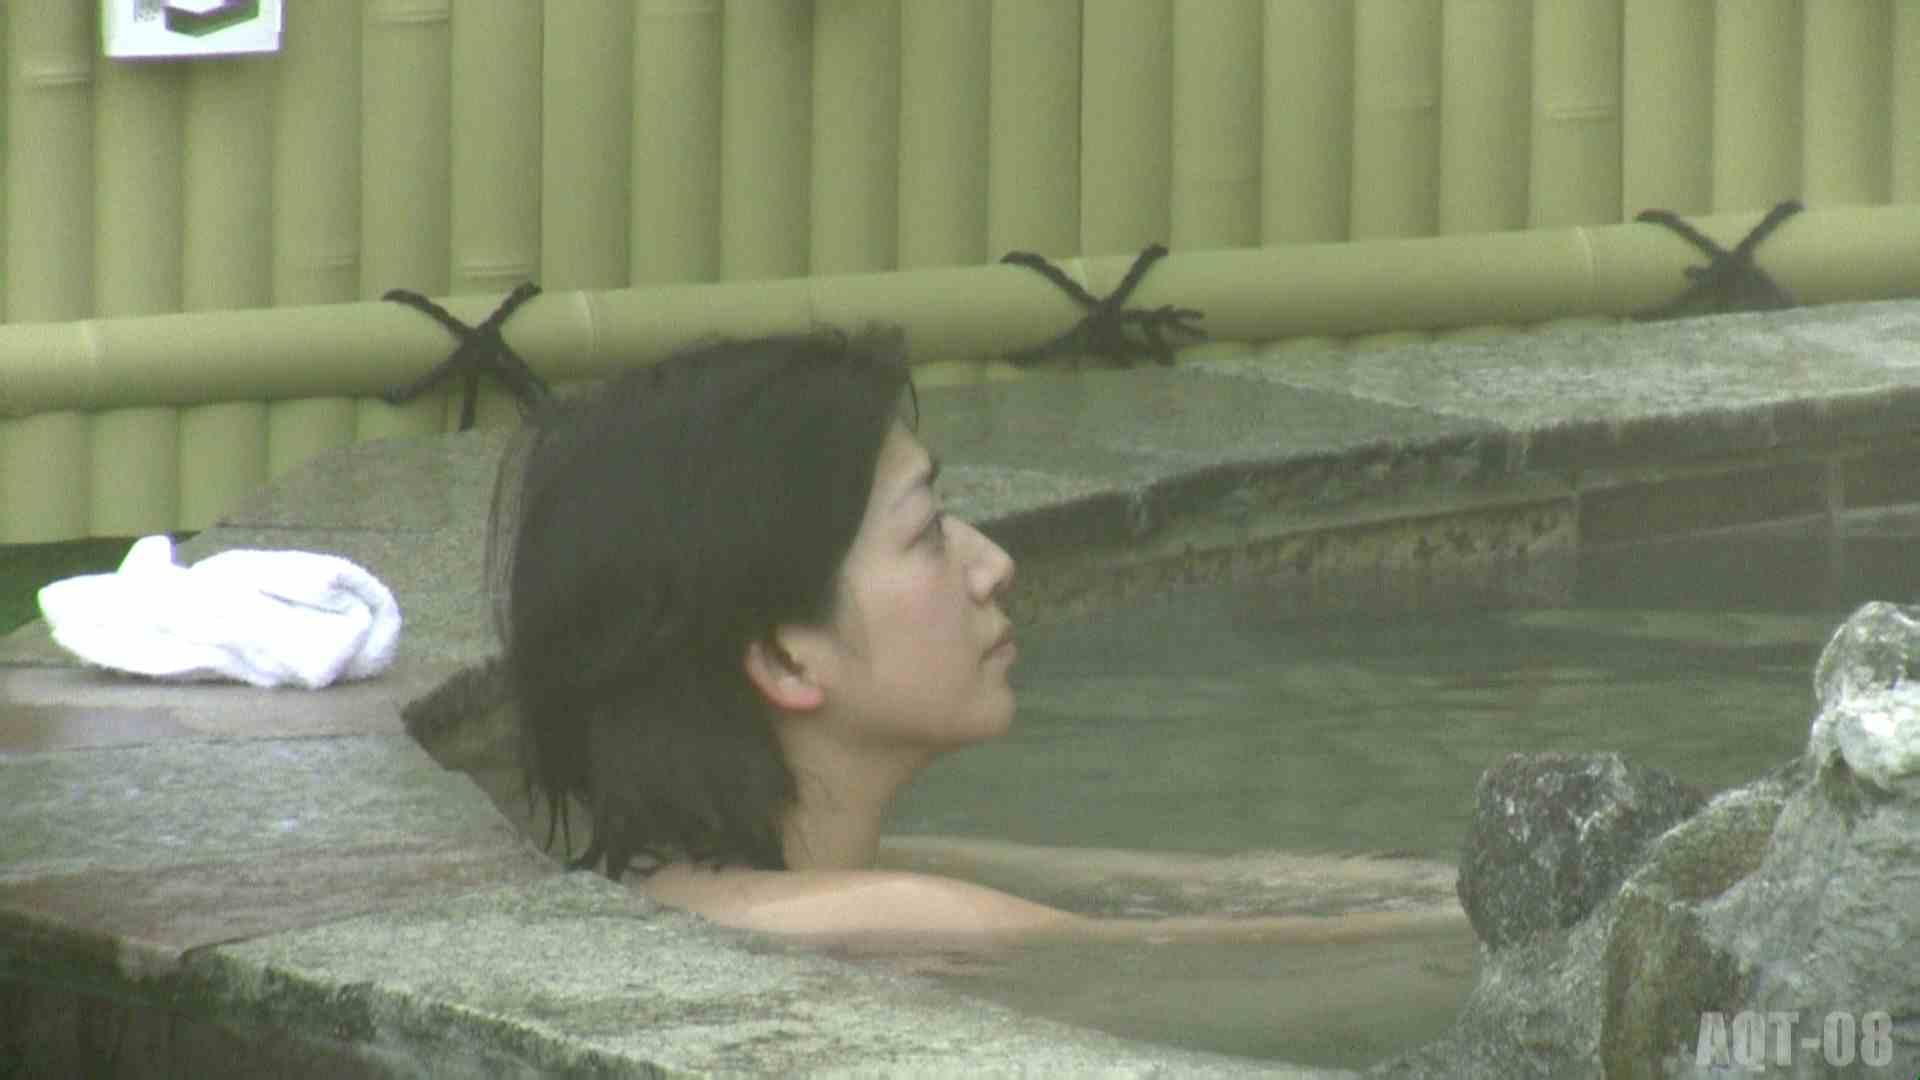 Aquaな露天風呂Vol.776 露天 | OLセックス  108画像 103